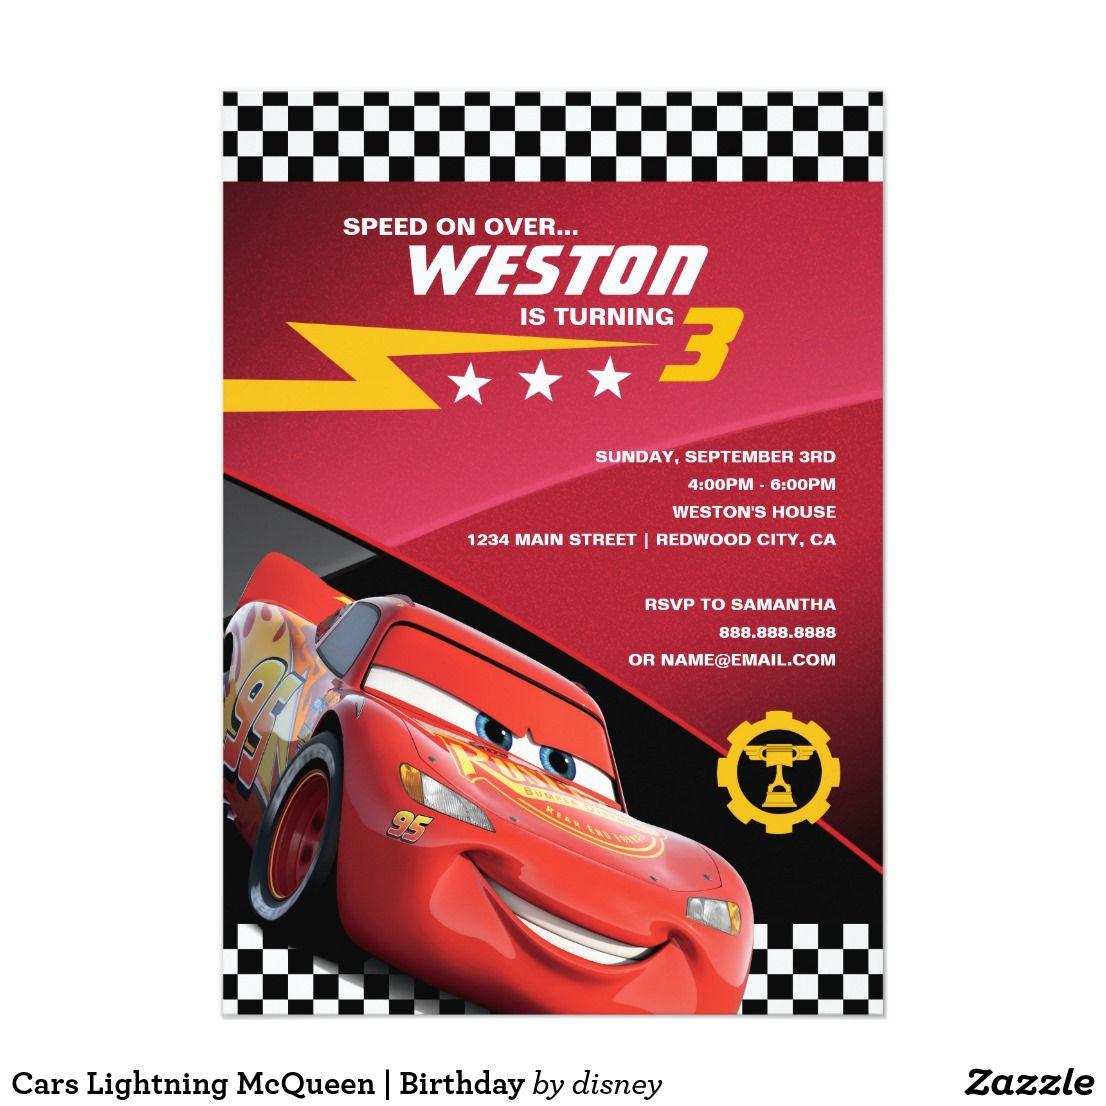 Invitacion Relampago De Autos Mcqueen Cumpleanos Zazzle Com Cars Birthday Invitations Lightning Mcqueen Cars Birthday Parties